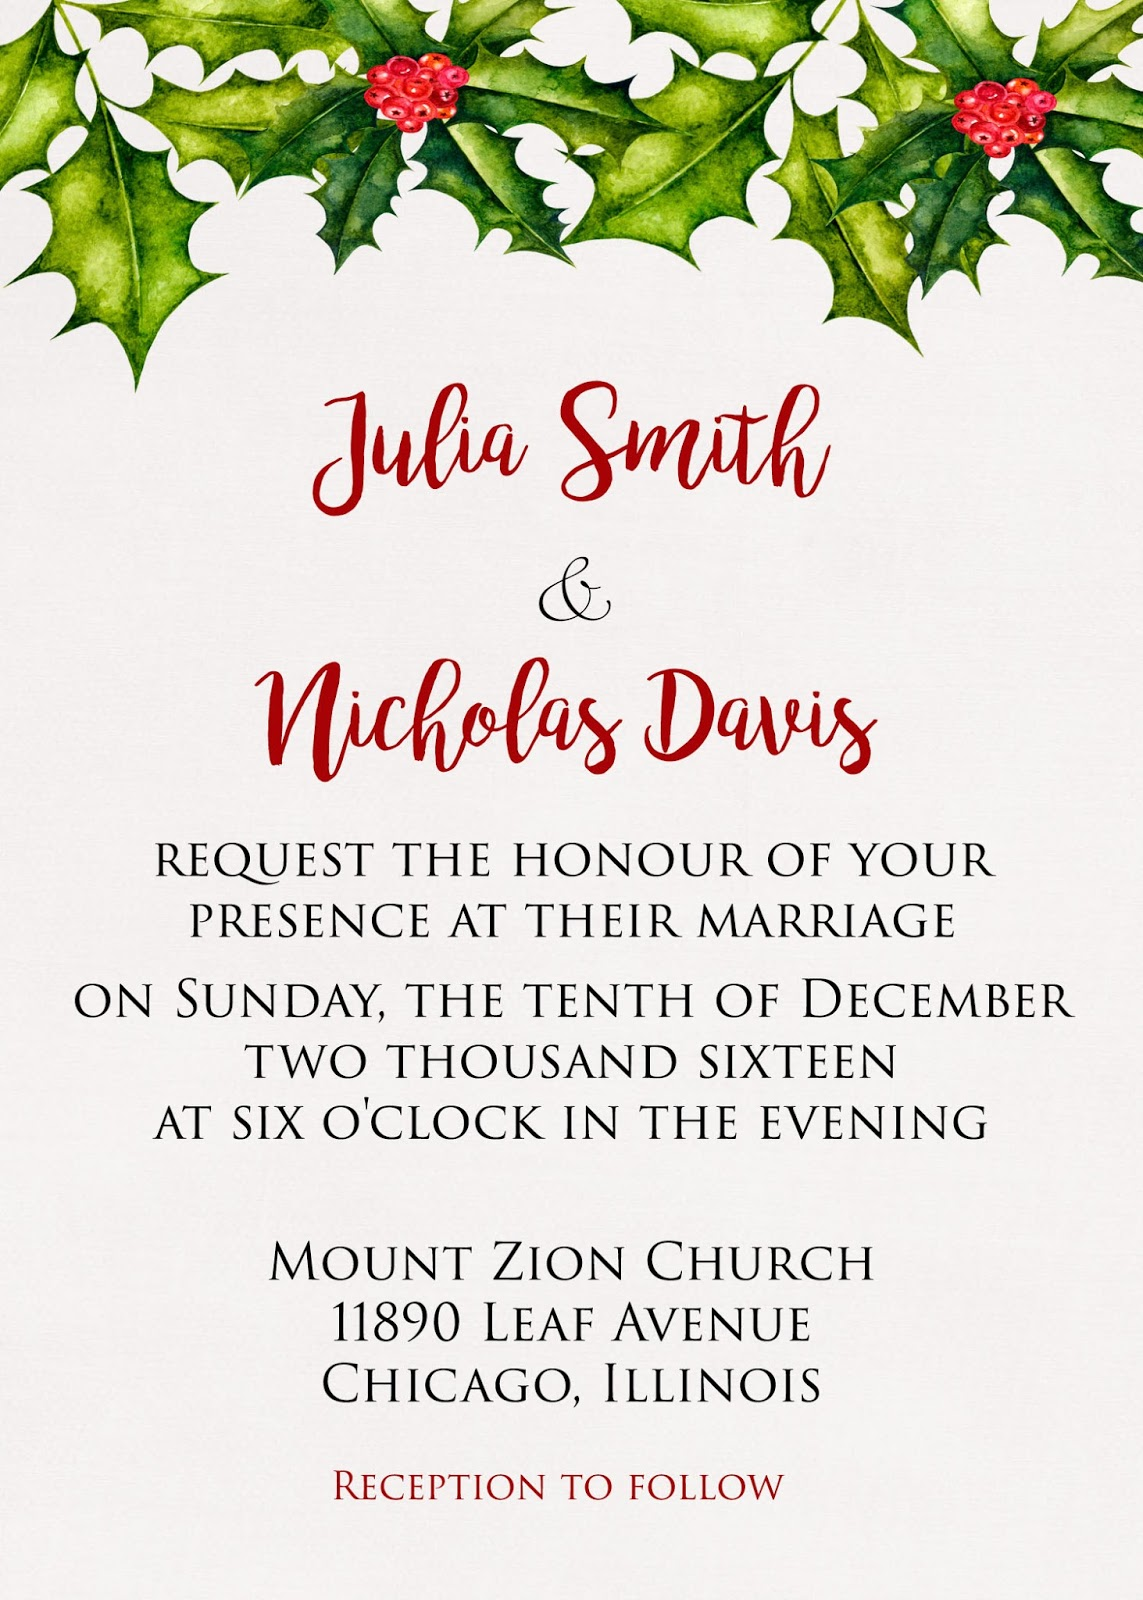 Sugar and Spice Invitations: Top 50 Christmas Wedding Invitations